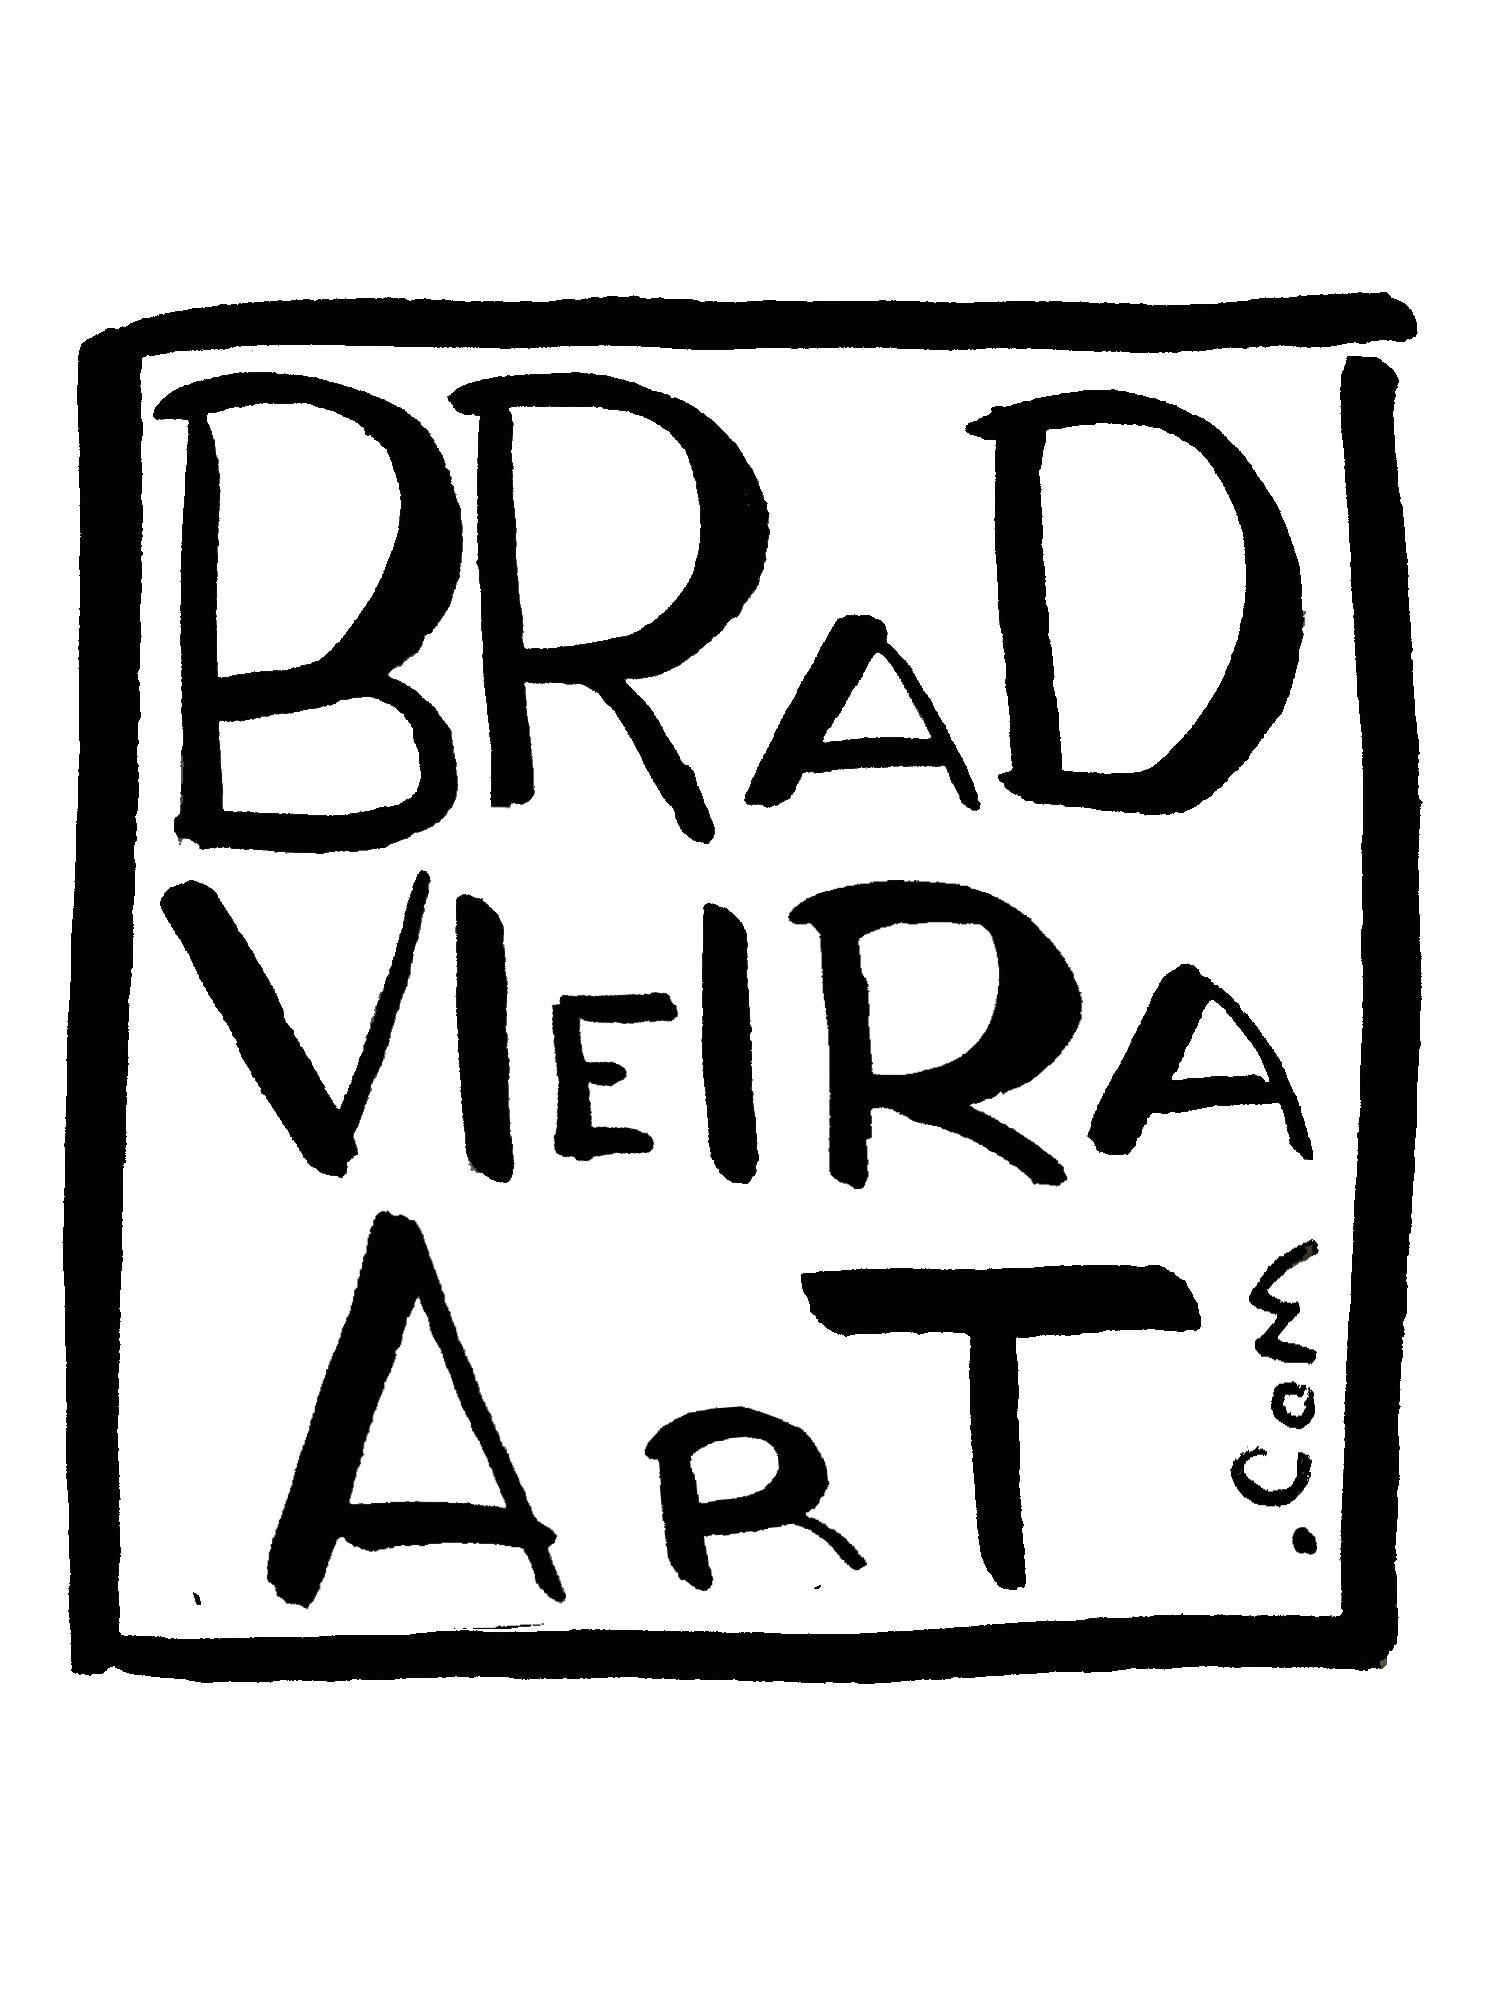 Brad Vieira Art Logo Final.jpg